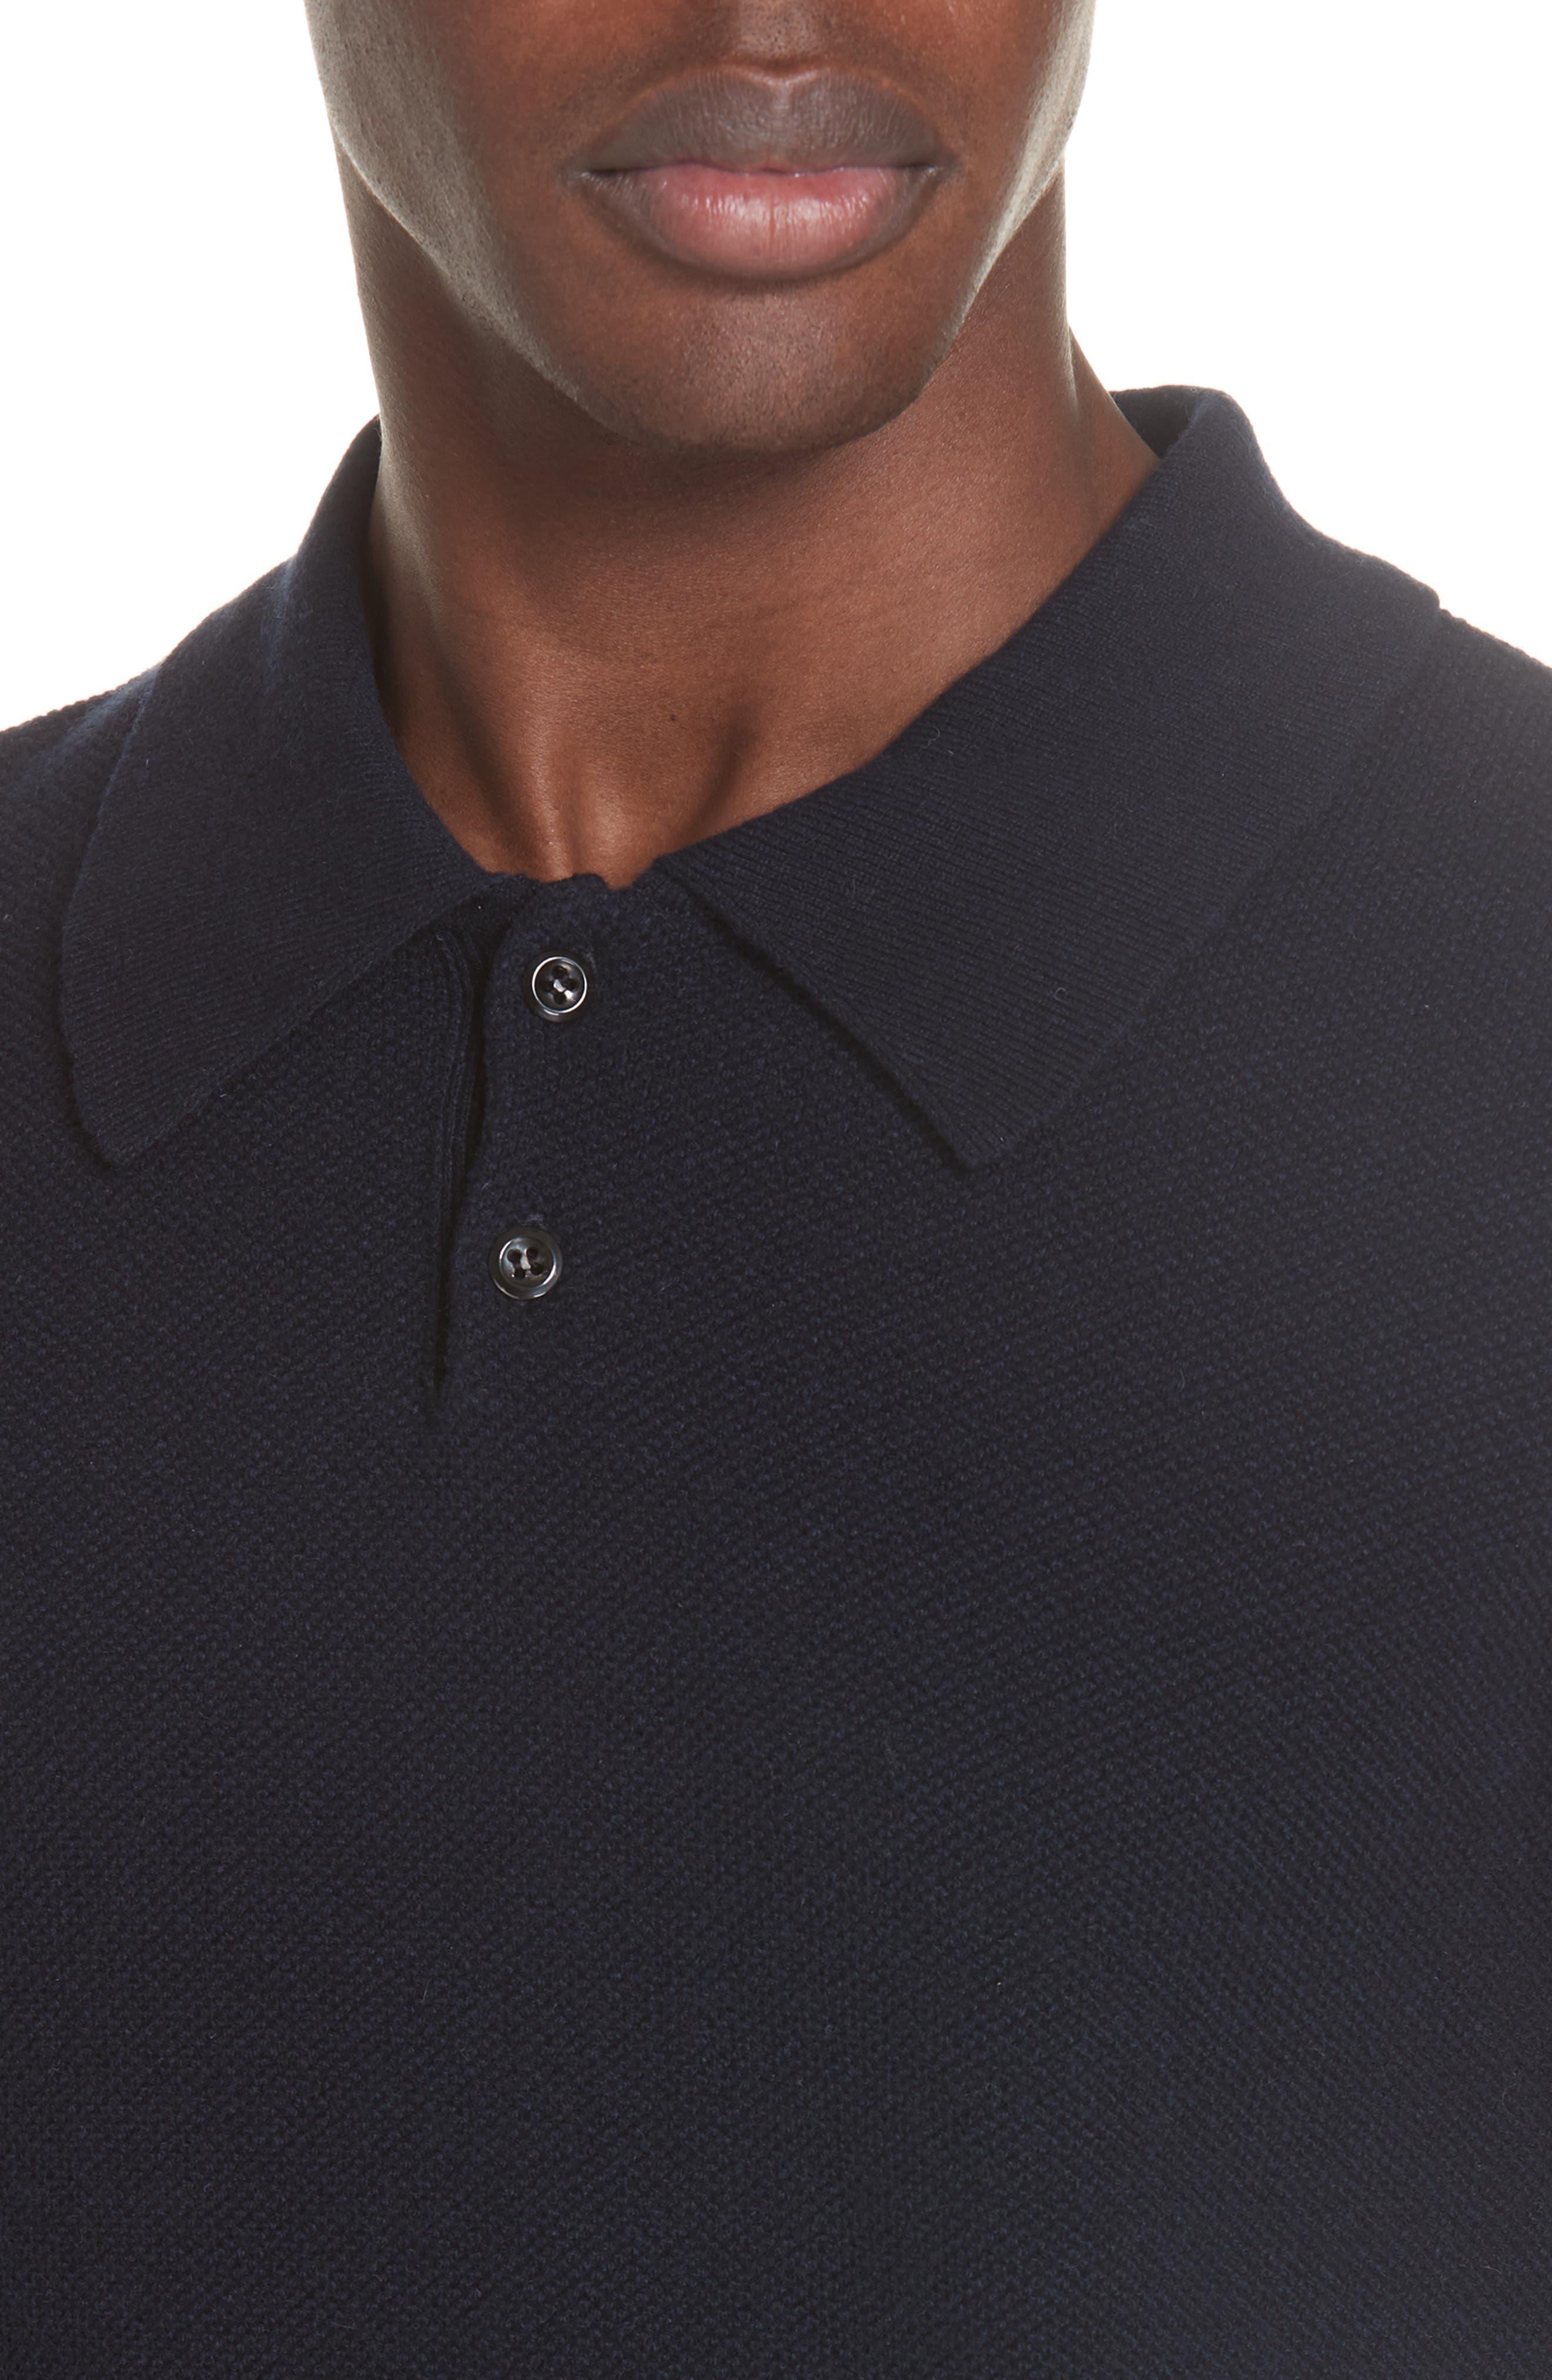 Wool & Cashmere Long Sleeve Polo,                             Alternate thumbnail 4, color,                             IAK NAVY